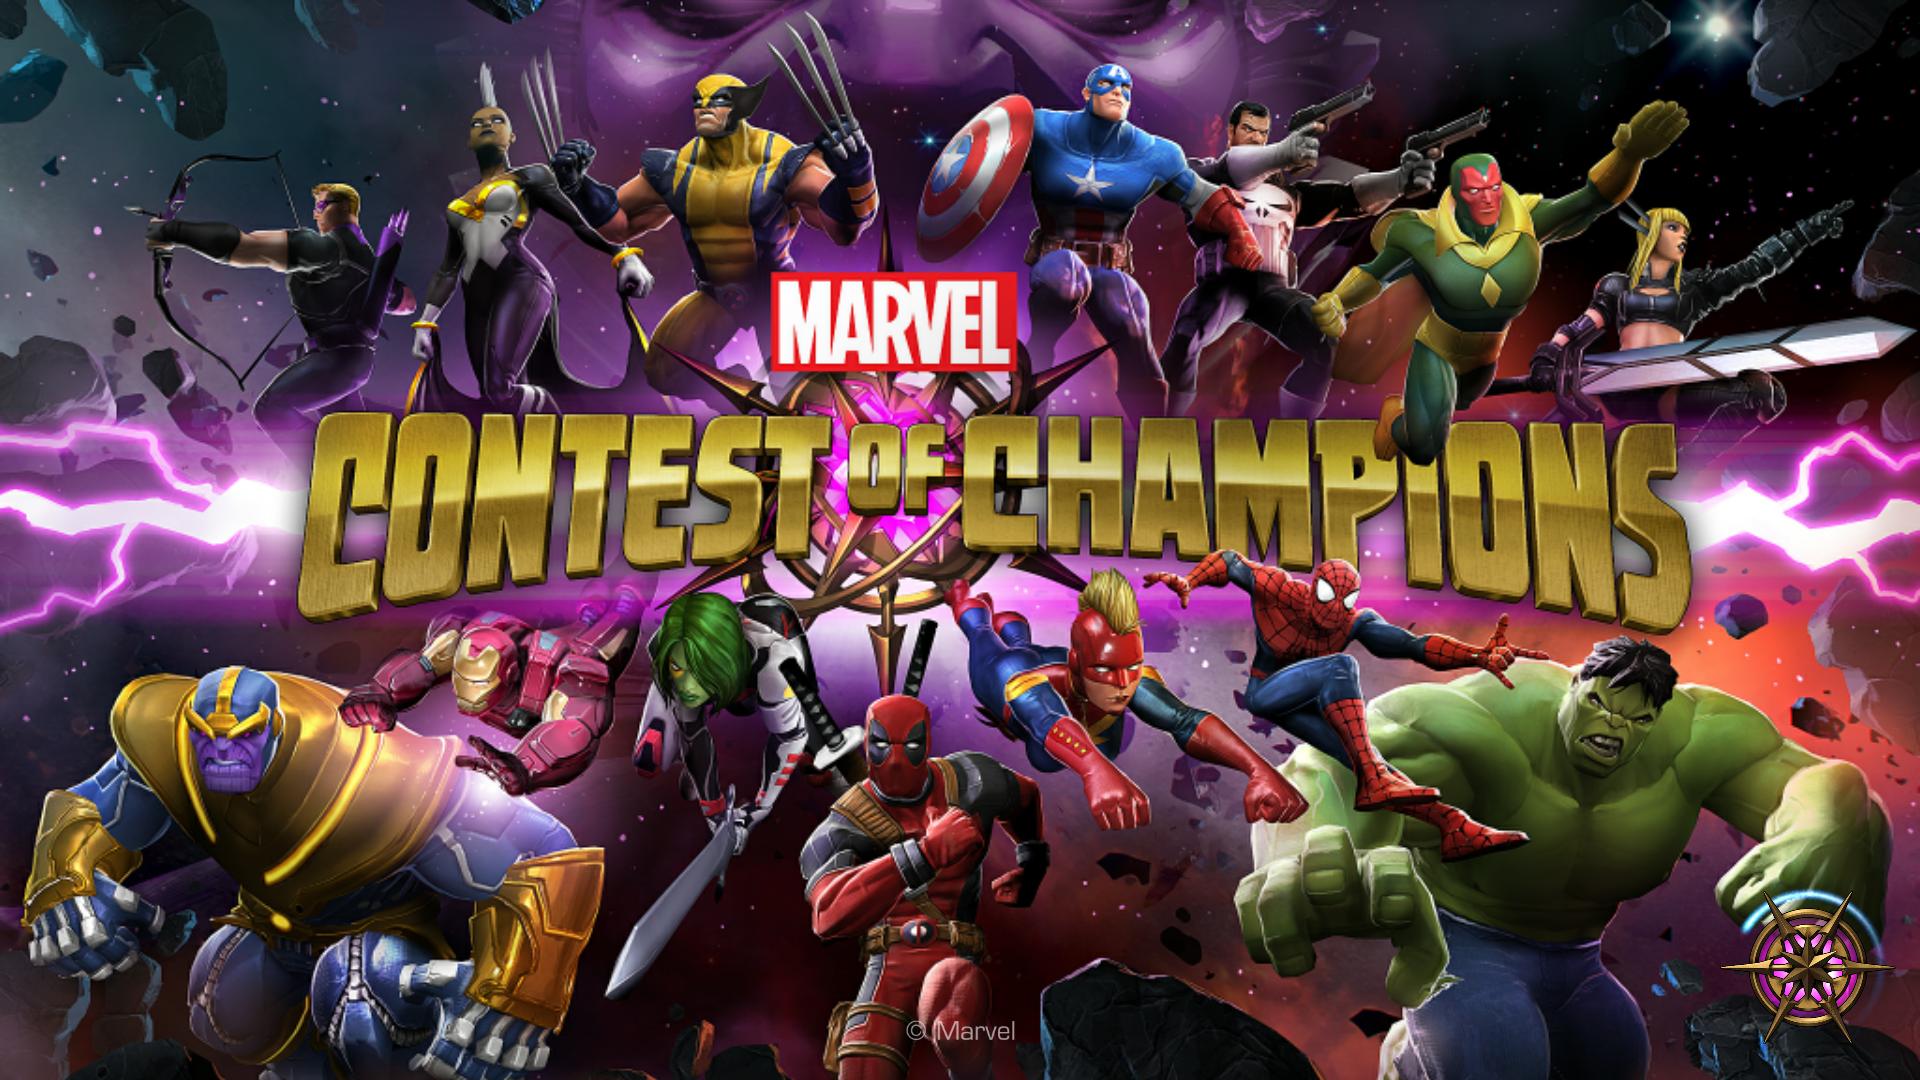 Marvel: Contest of Champions (videojuego)